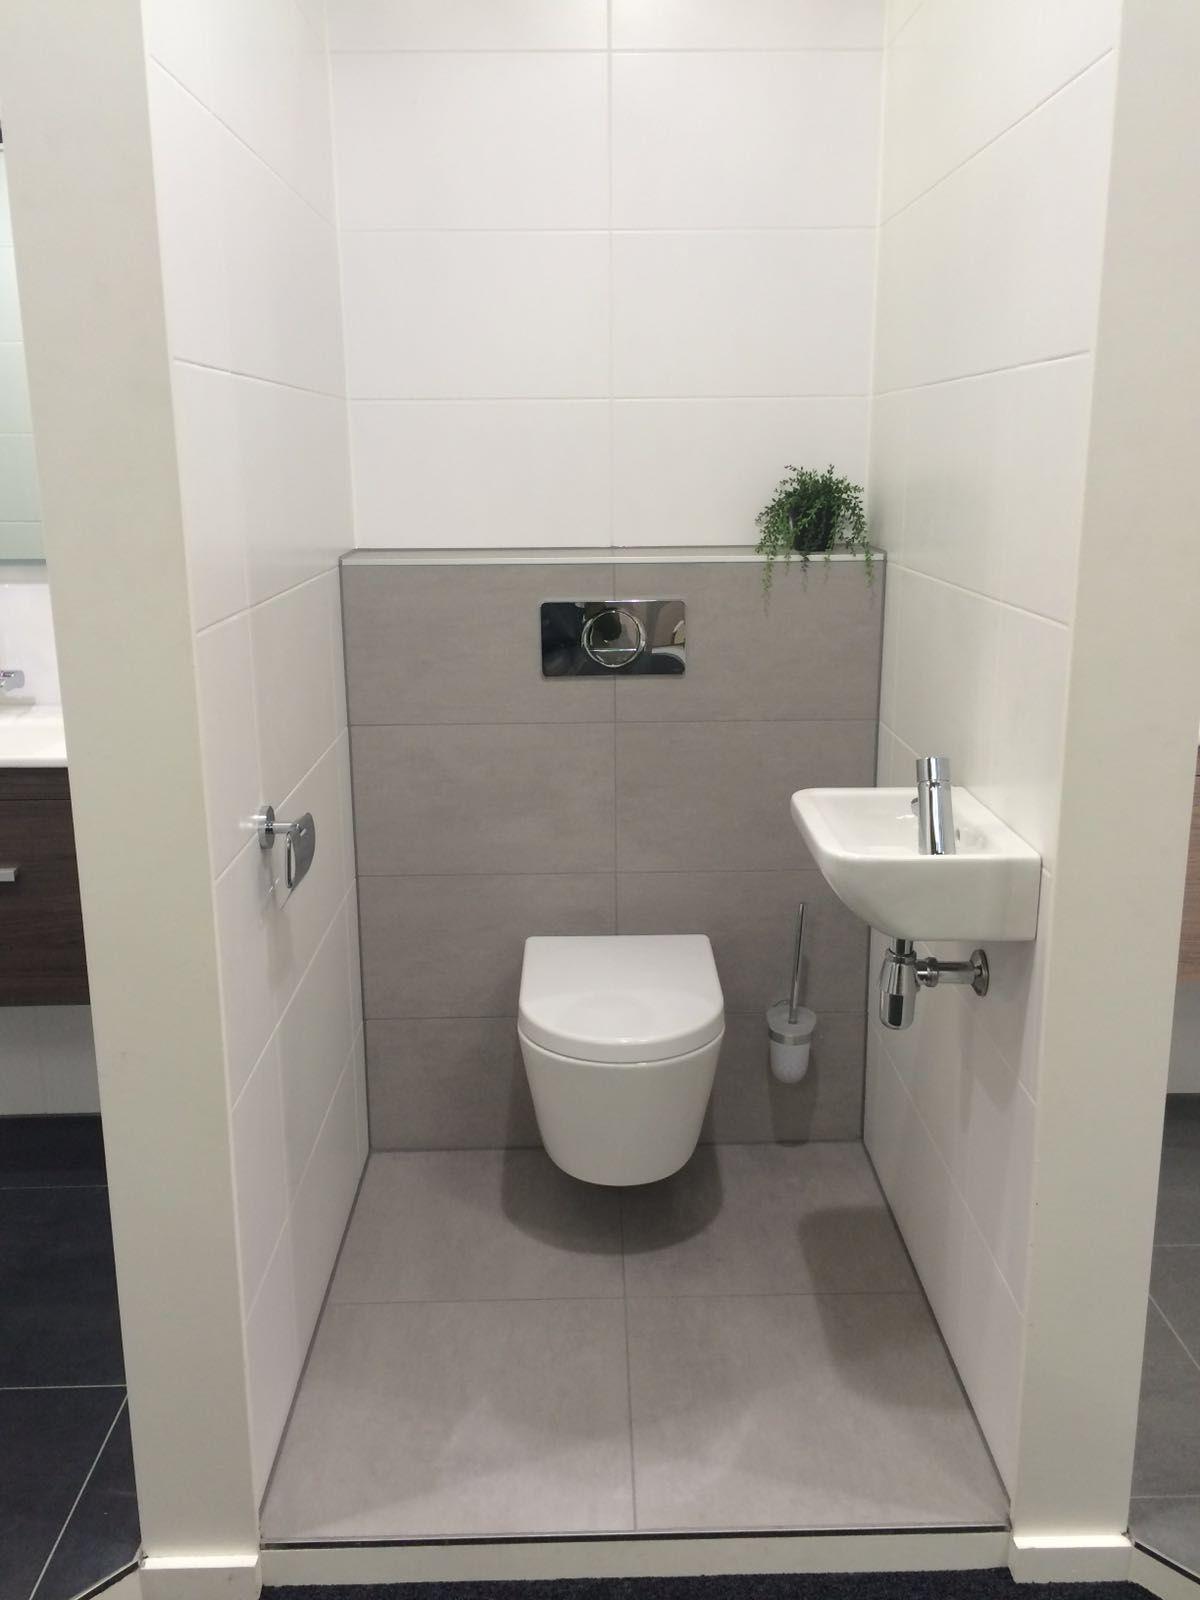 Hellgrau bathroom toilet wc badkamer muurtje toiletpot